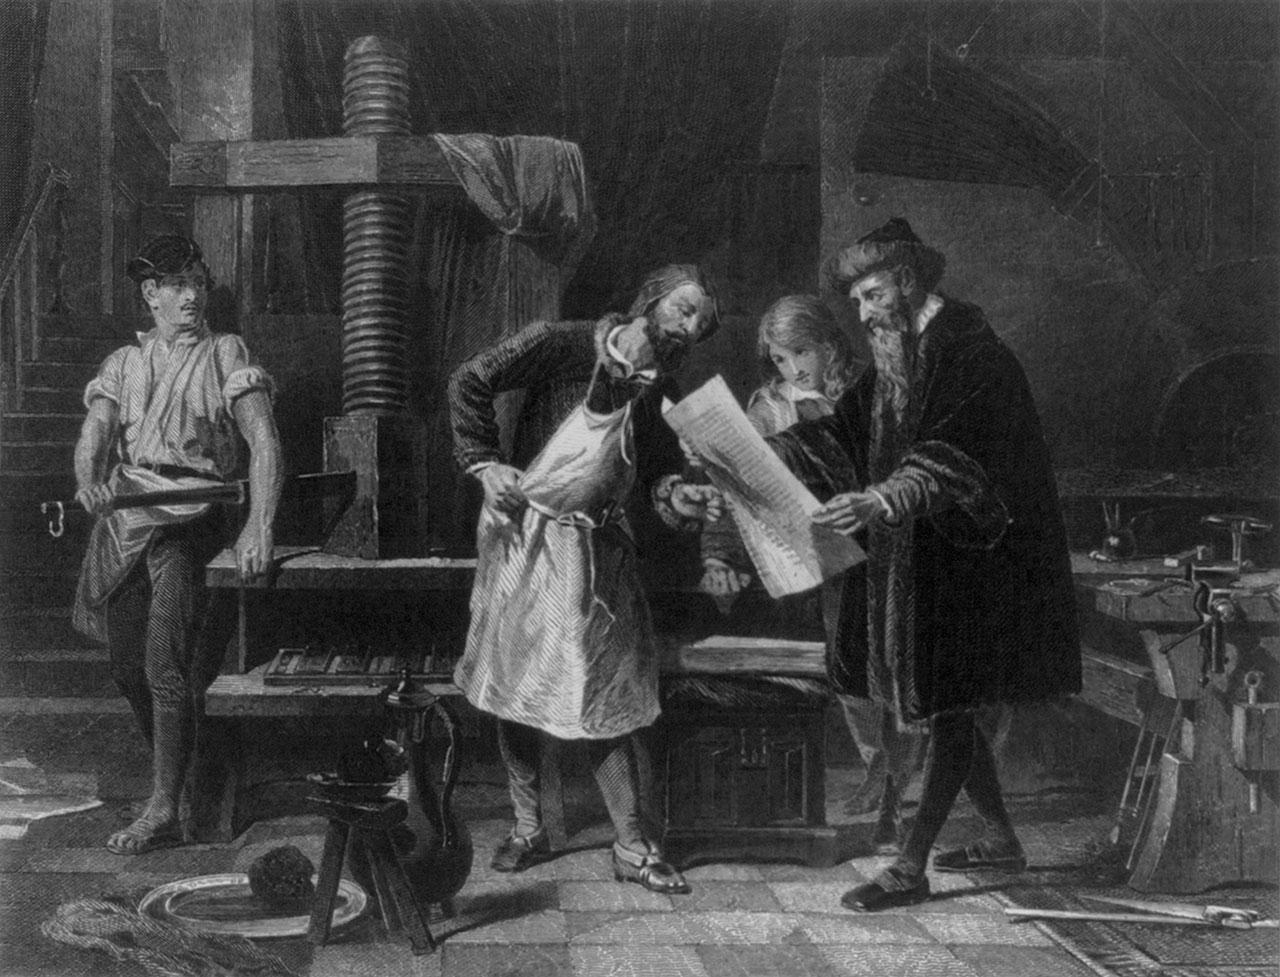 Johannes Gutenberg invente la presse à imprimer